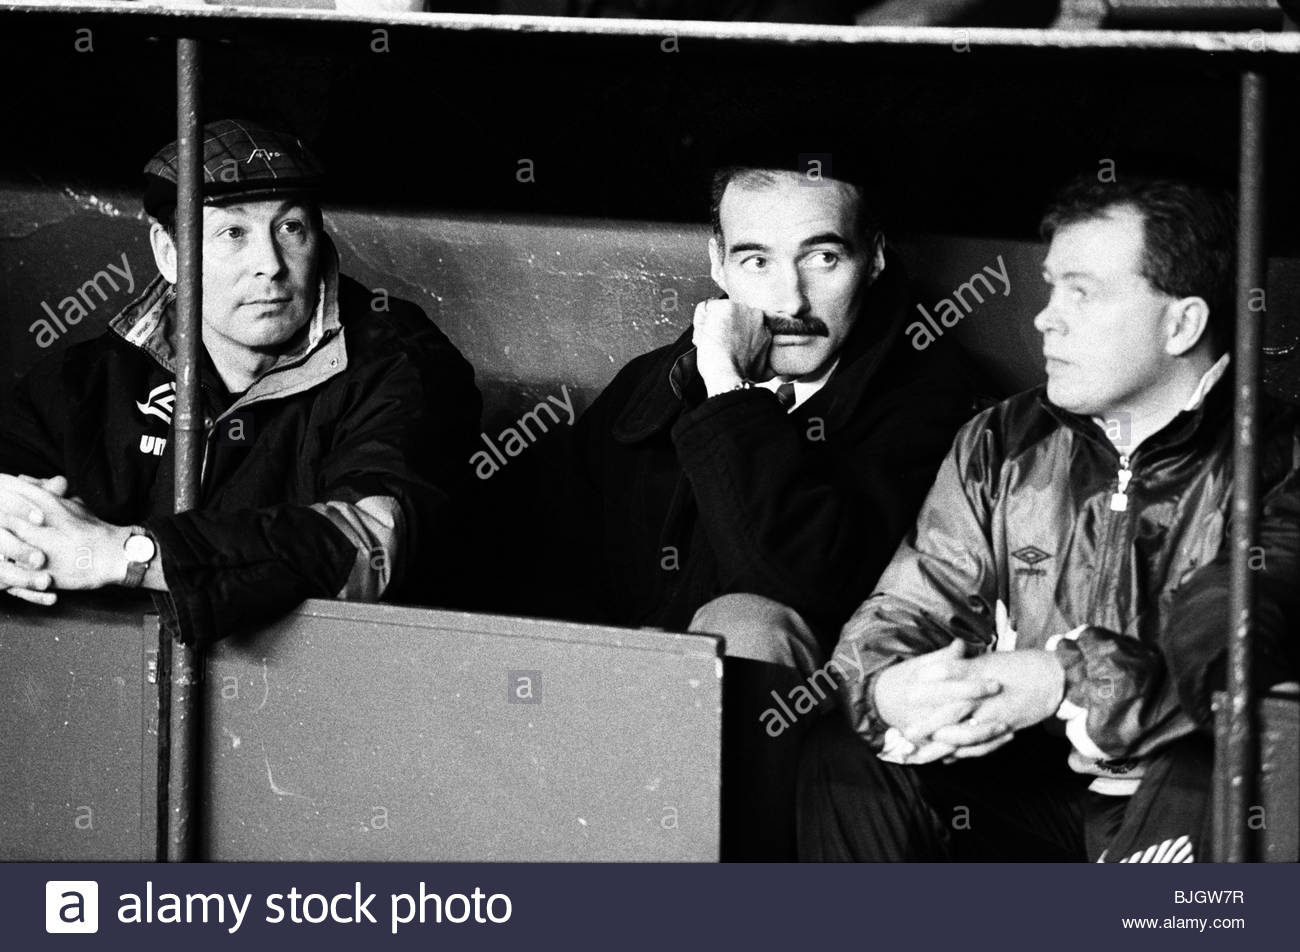 25/02/92 PREMIER DIVISION RANGERS v ABERDEEN (0-0) IBROX - GLASGOW Aberdeen manager Willie Miller (centre). - Stock Image